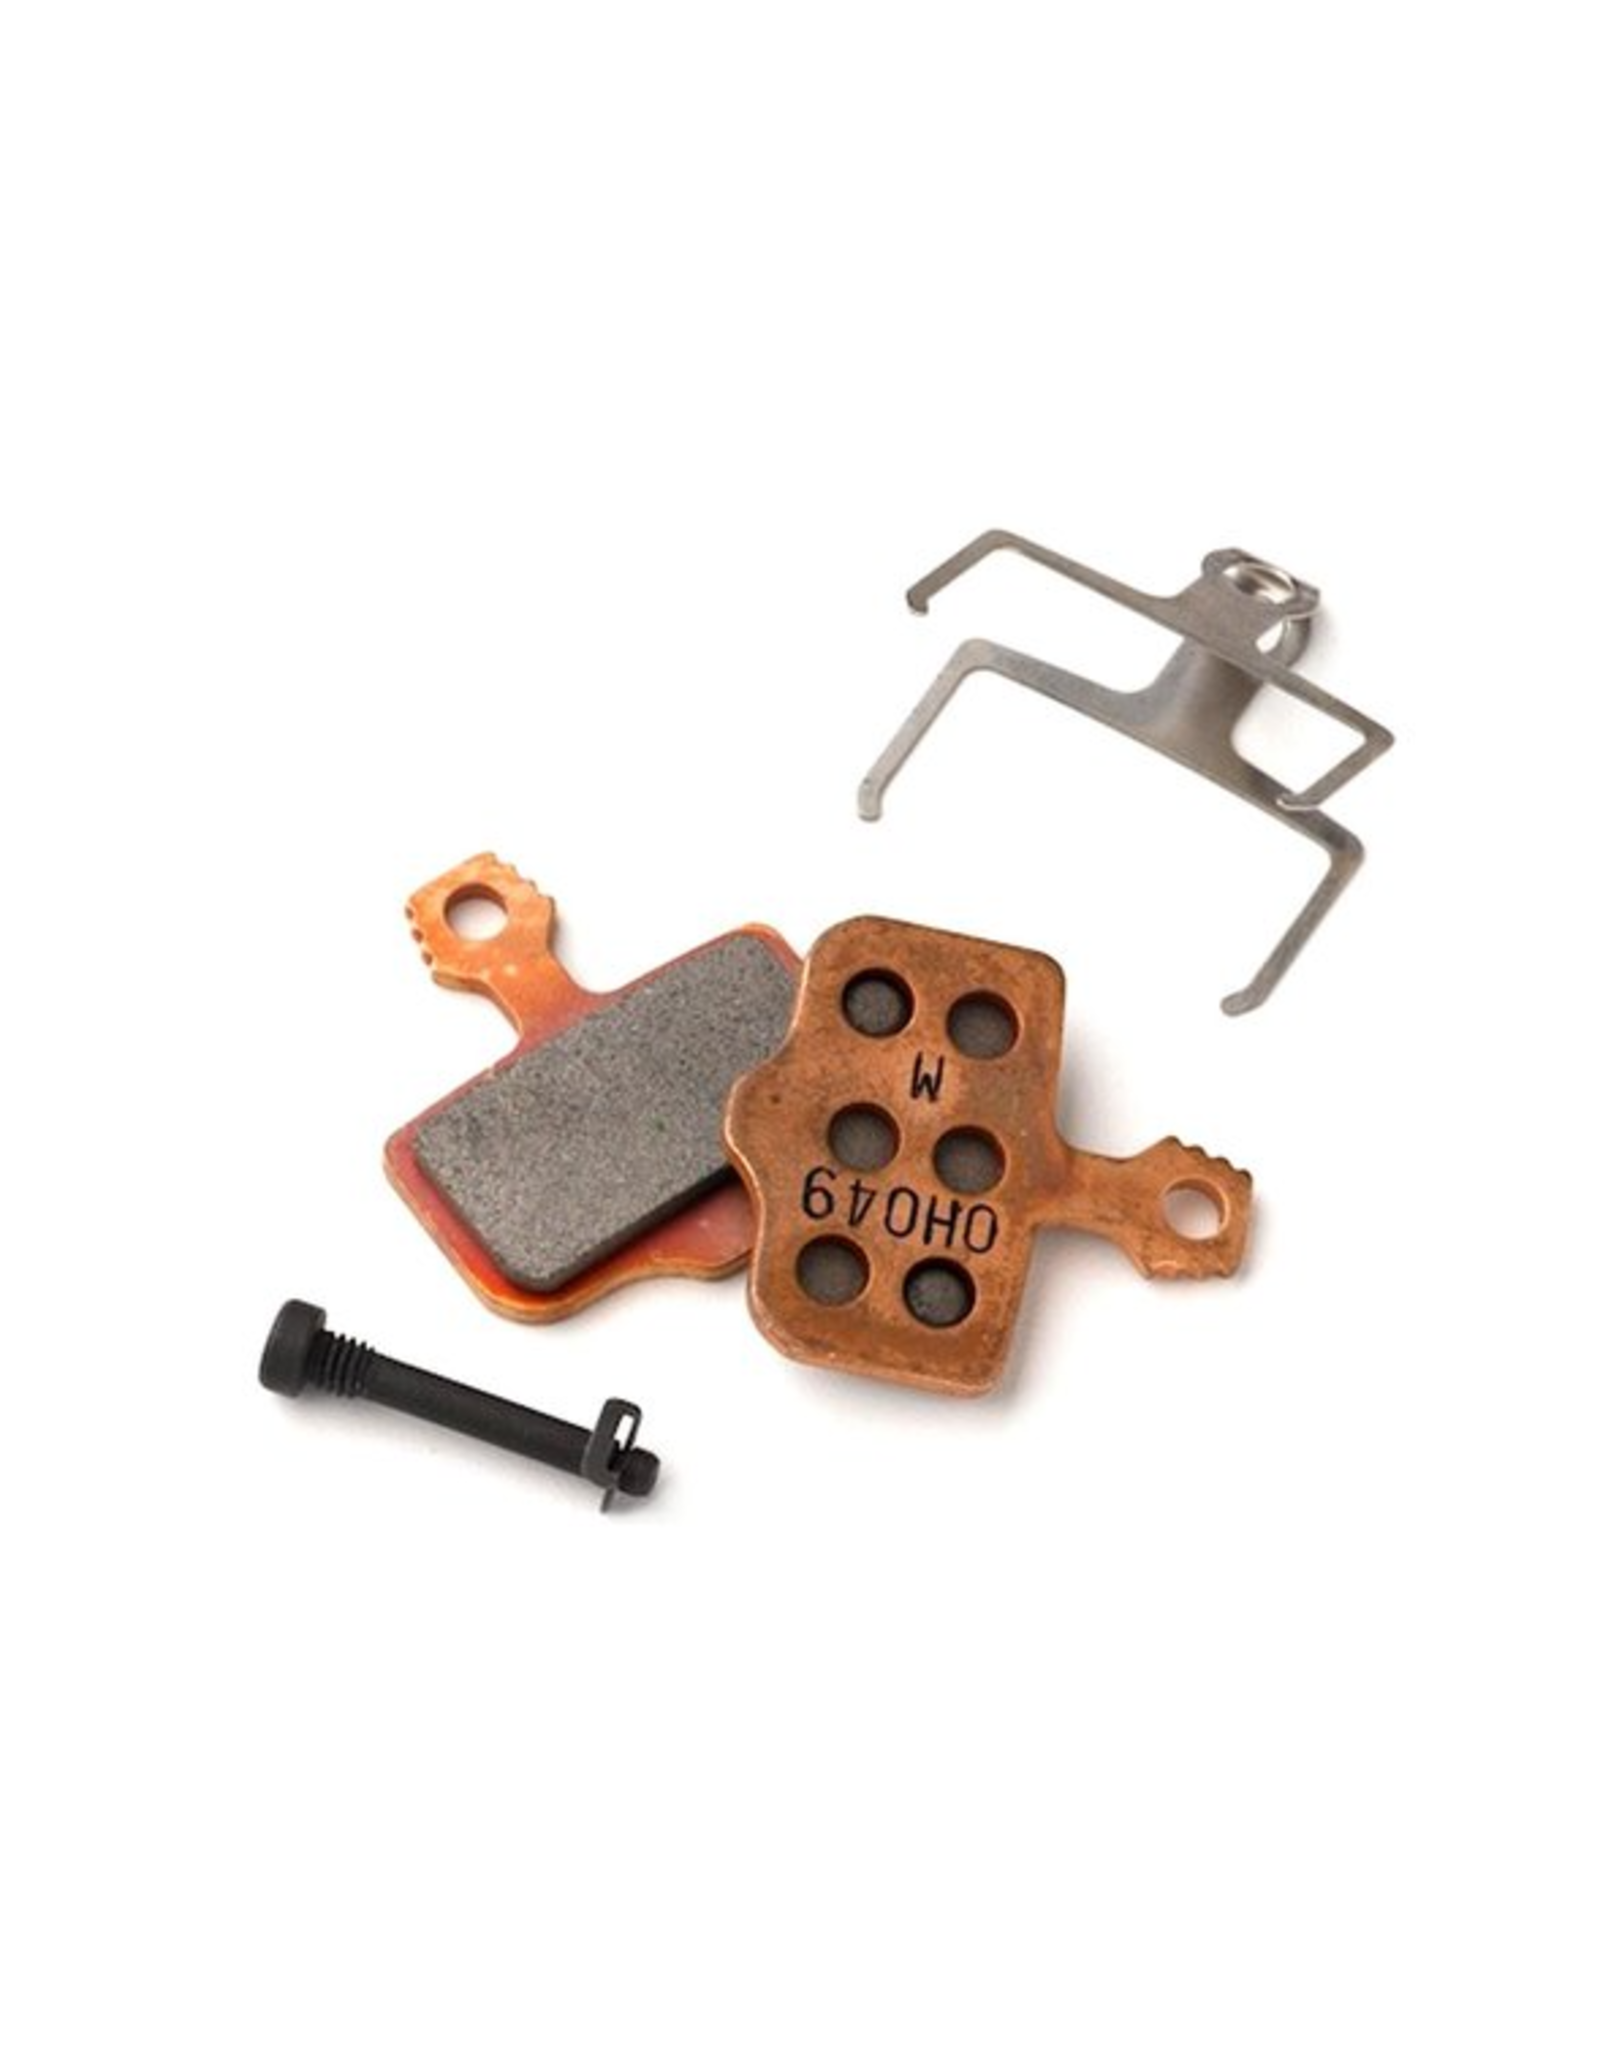 AVID SRAM, 00.5315.035.010, Disc Brake Pads, Shape: Avid Elixir/SRAM level/Force AXS HRD, Metallic, Pair